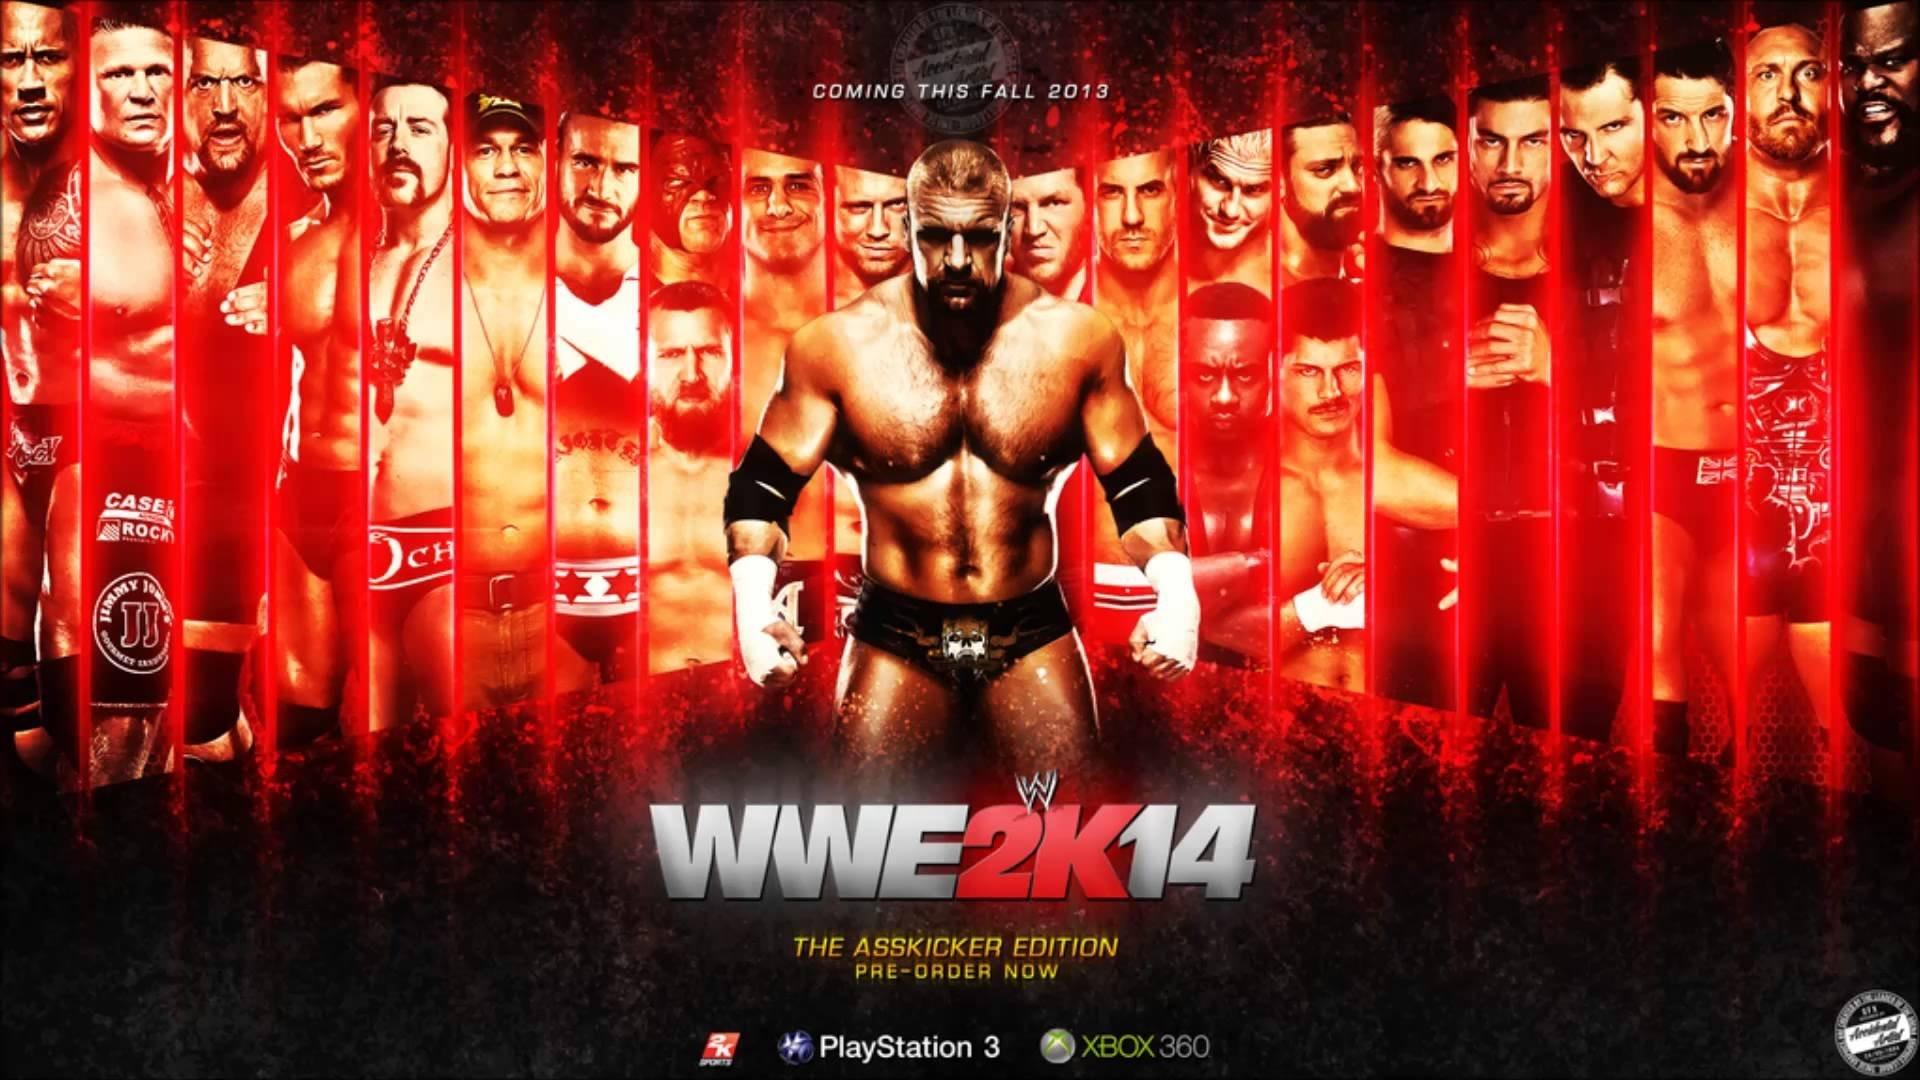 … wwe 2k14 wrestling fighting action warrior wallpaper …